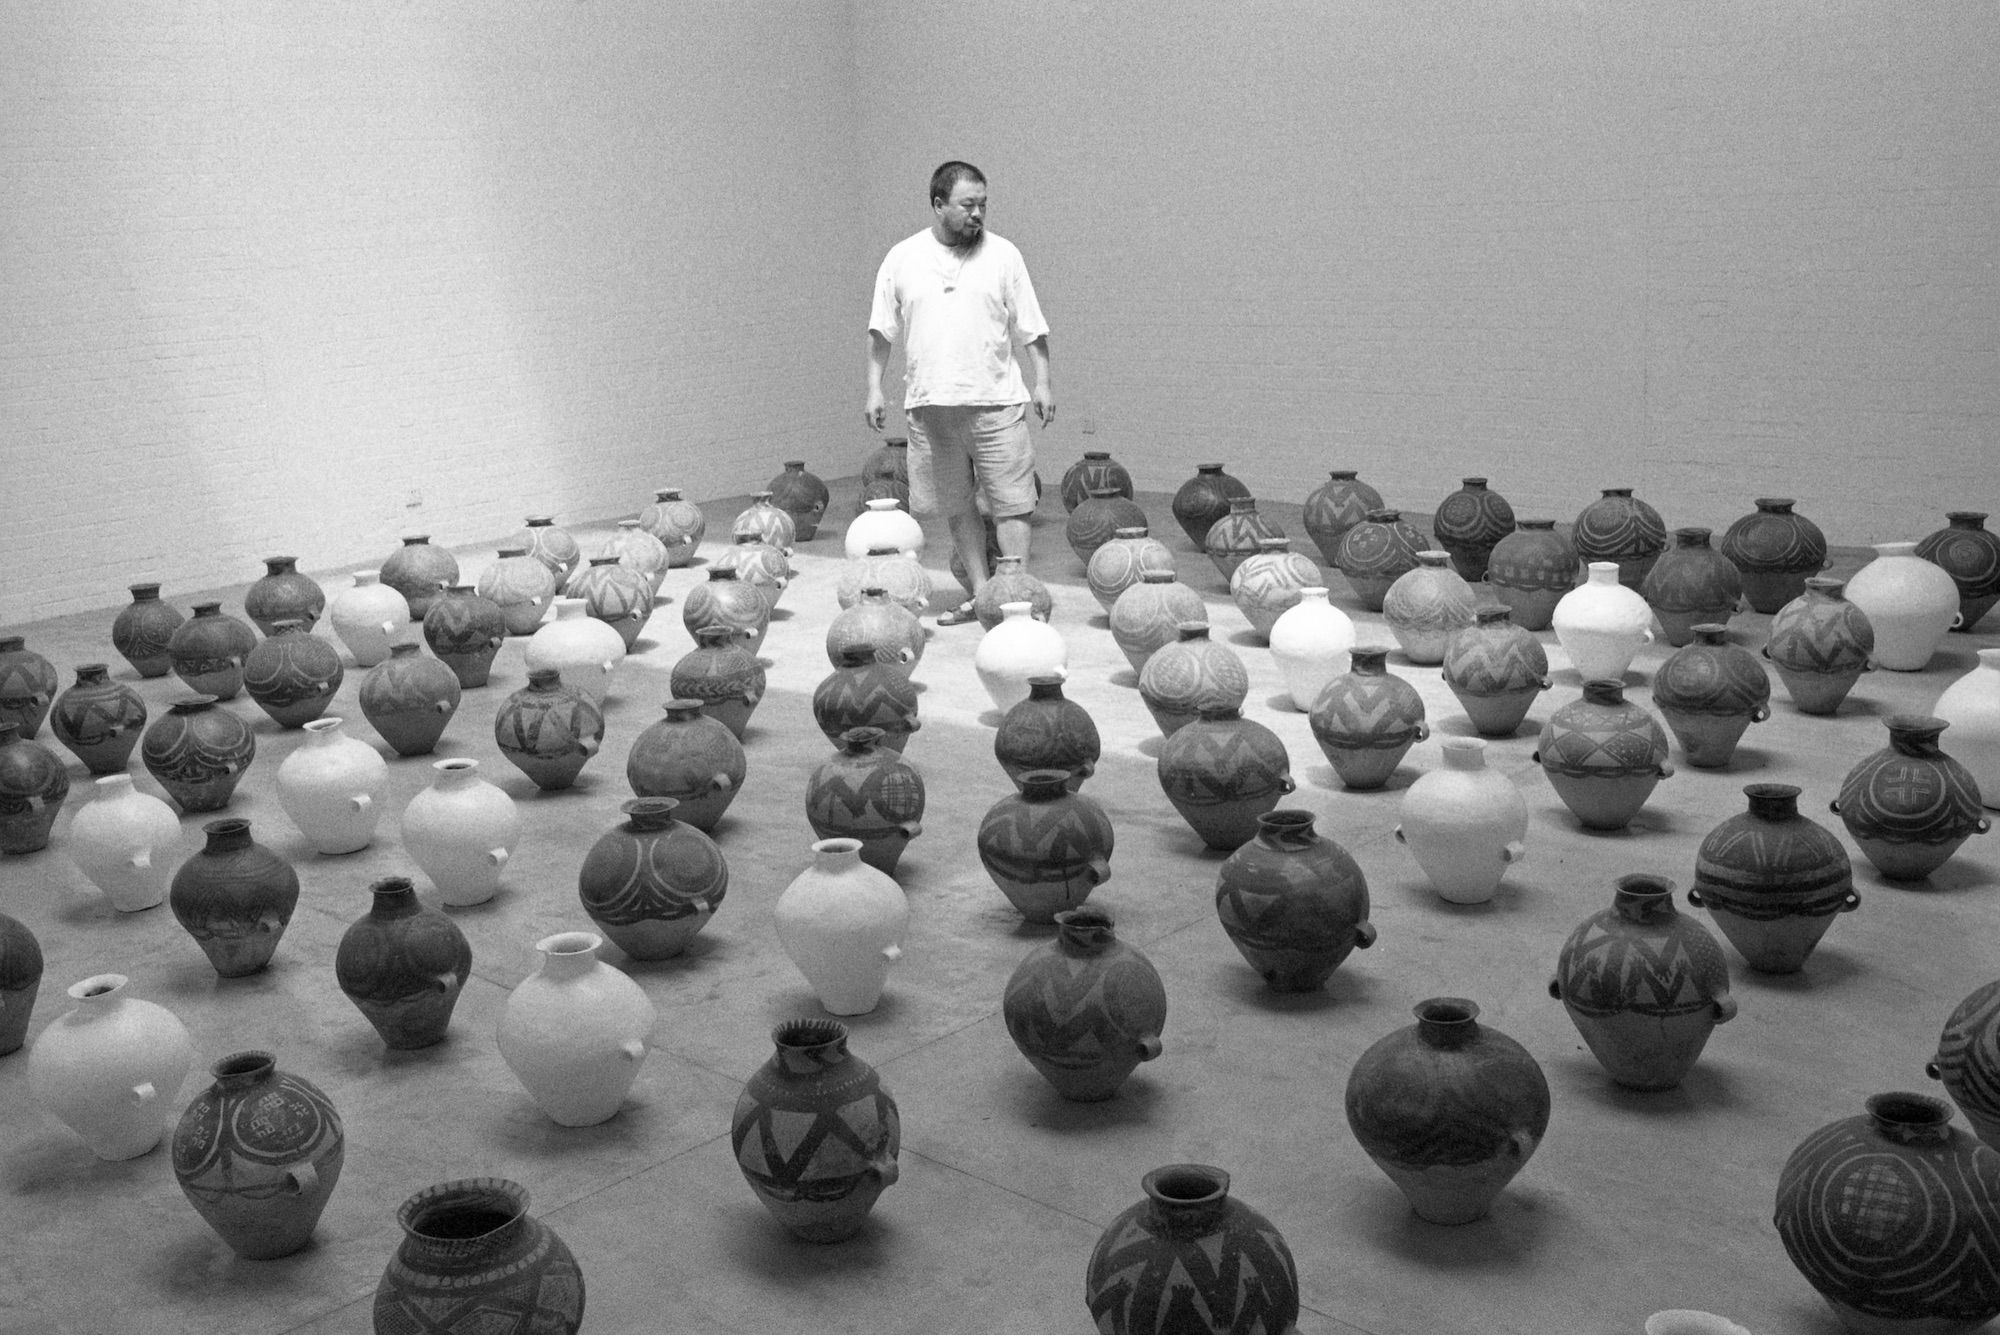 An Opening Door - Photographs by Ai Weiwei | Review by W. Scott Olsen | LensCulture